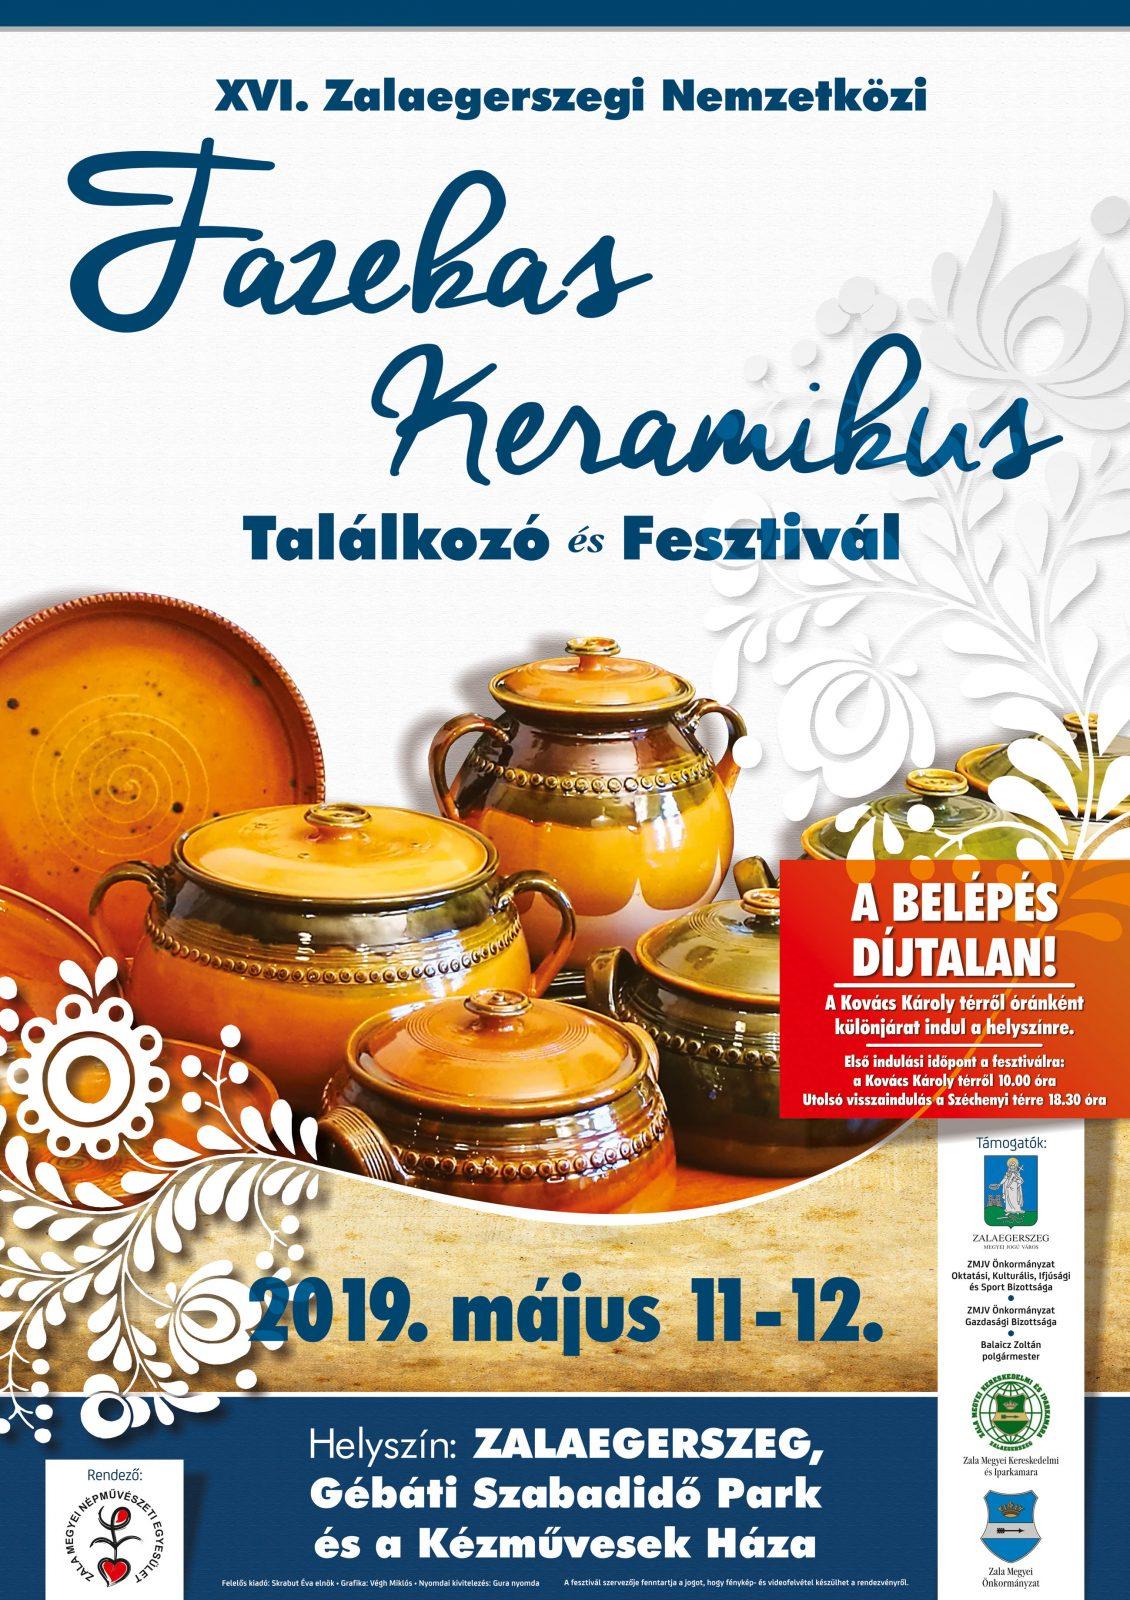 Orszagos-fazekas-keramikus-talalkozo-es-fesztival